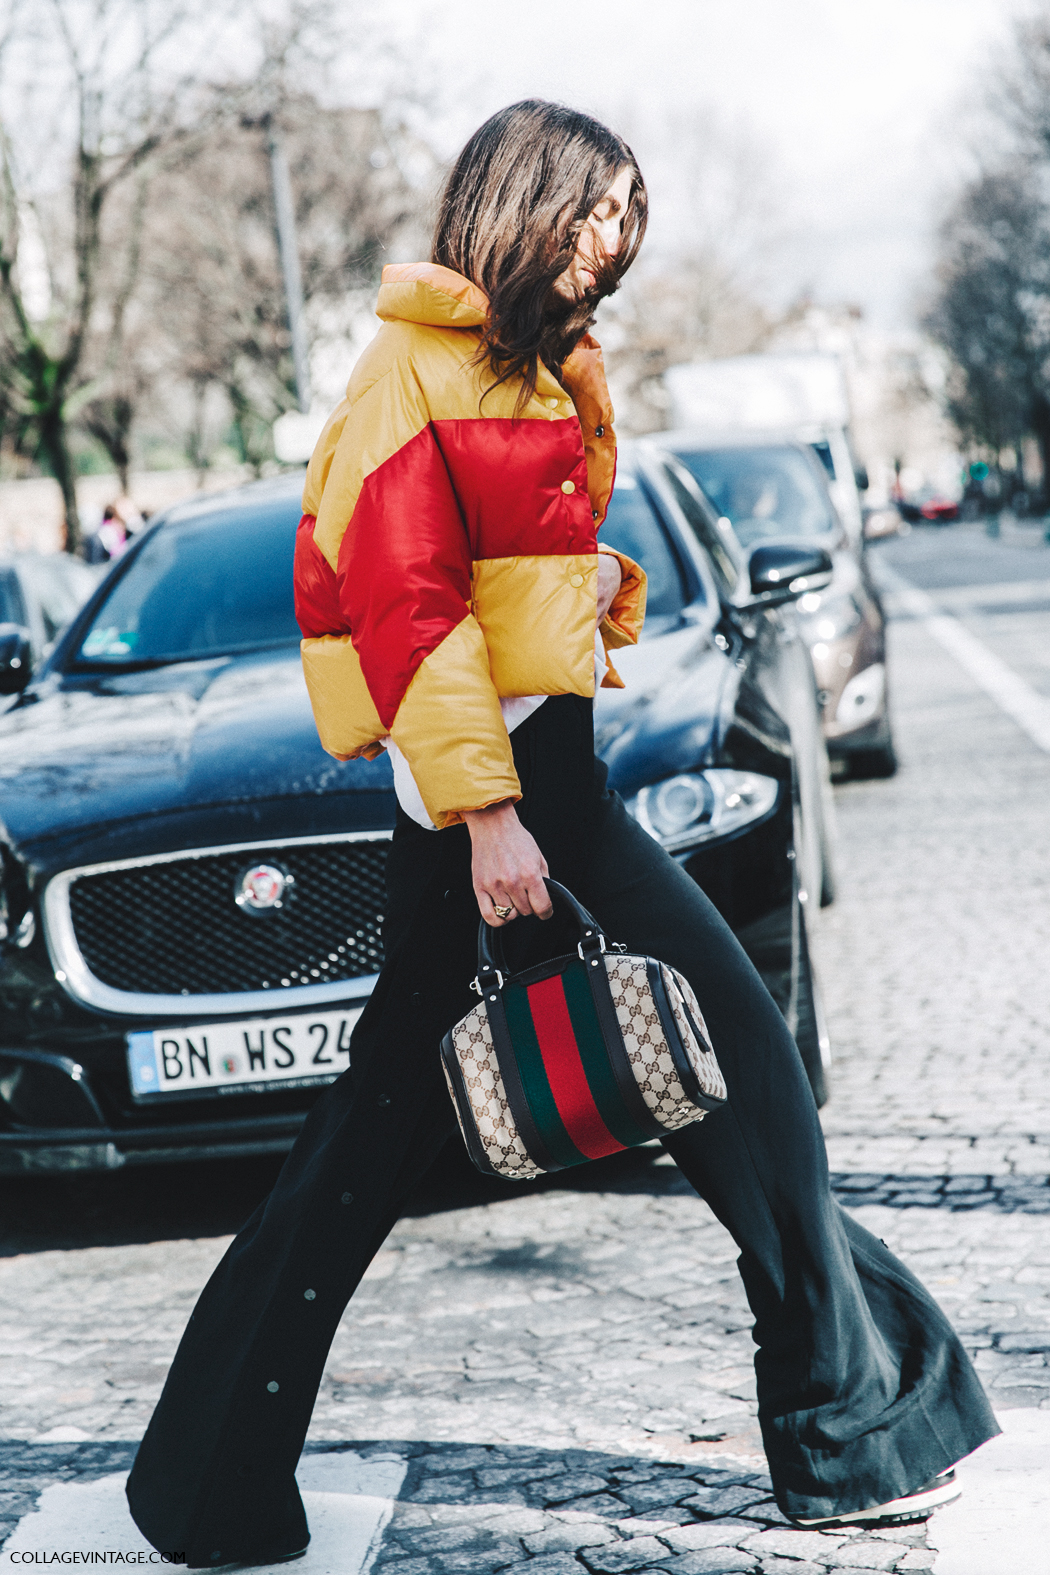 PFW-Paris_Fashion_Week_Fall_2016-Street_Style-Collage_Vintage-Ursina_Gisy-Gucci-Bomber-